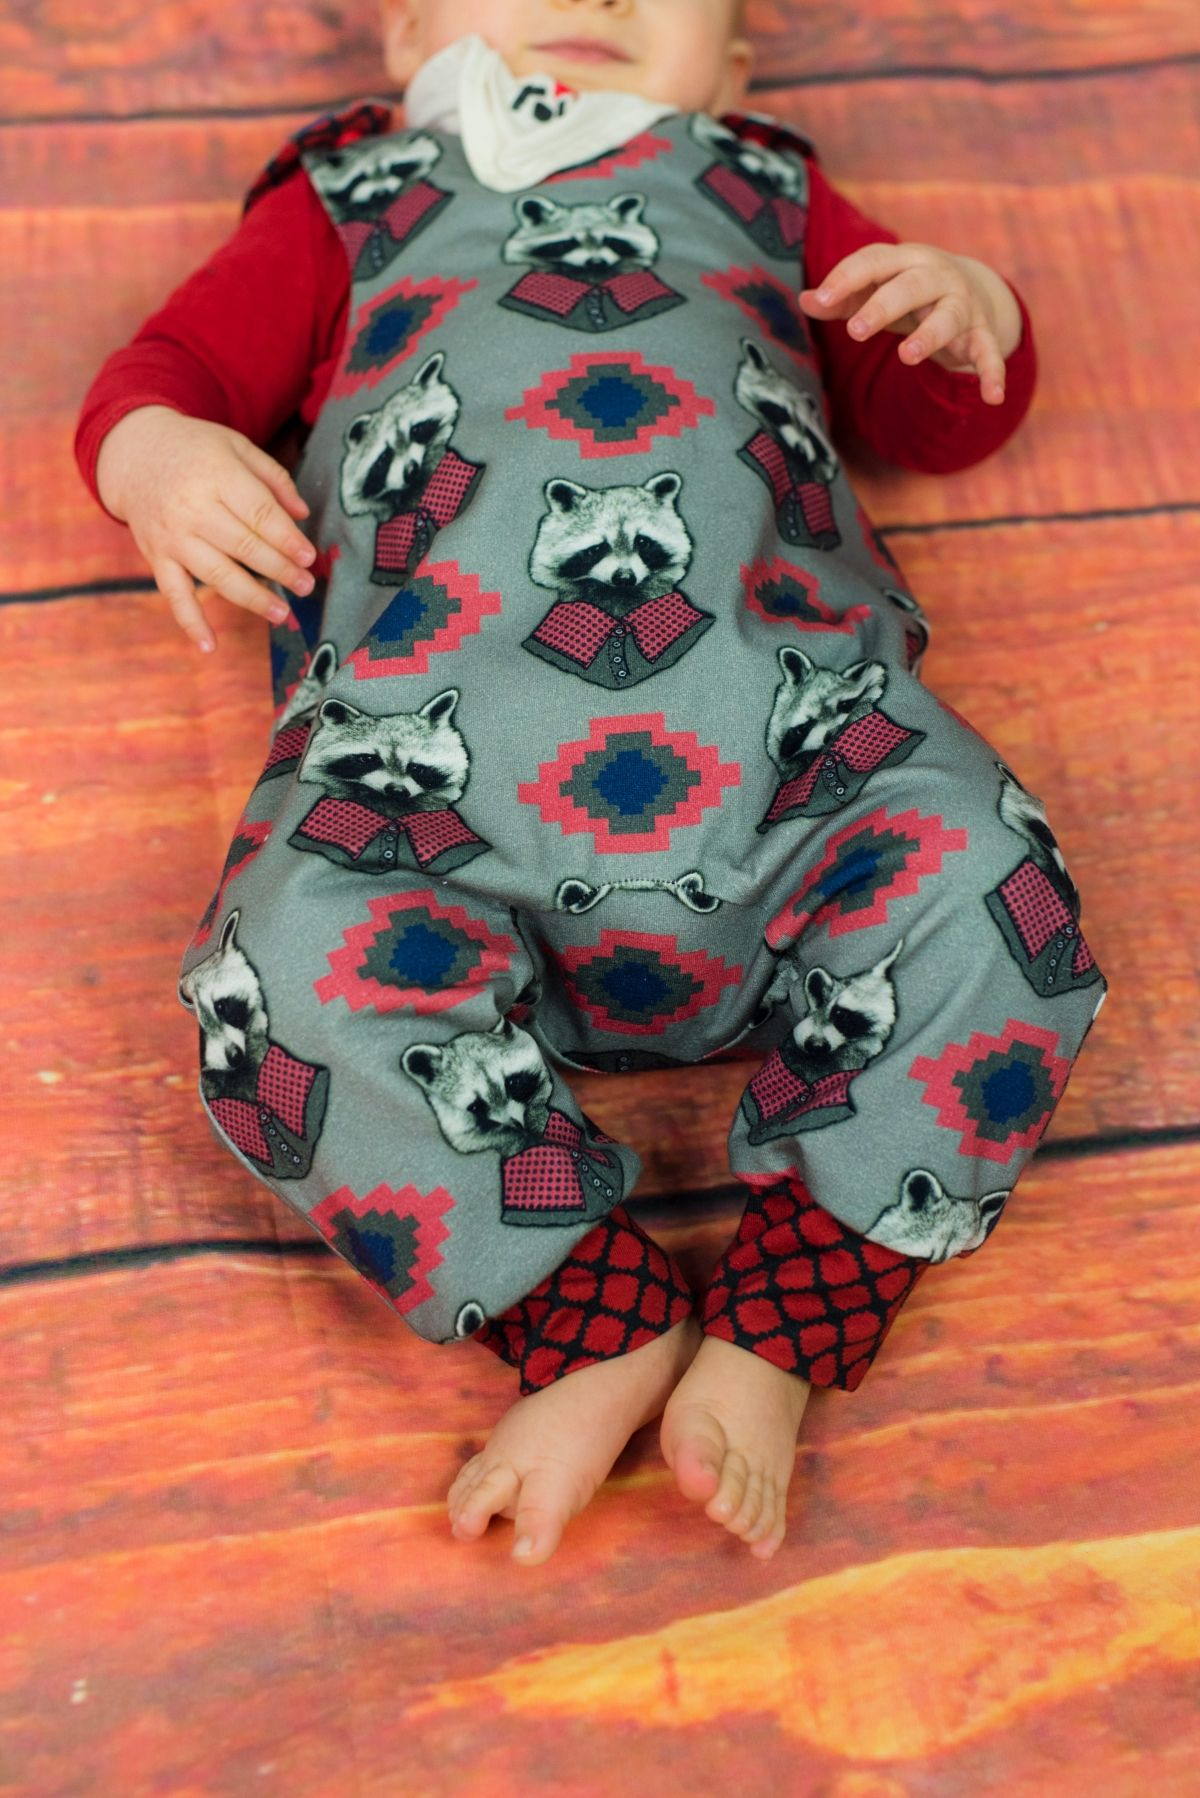 Party Baby | Strampelhose, Baby strampler und Nähen baby